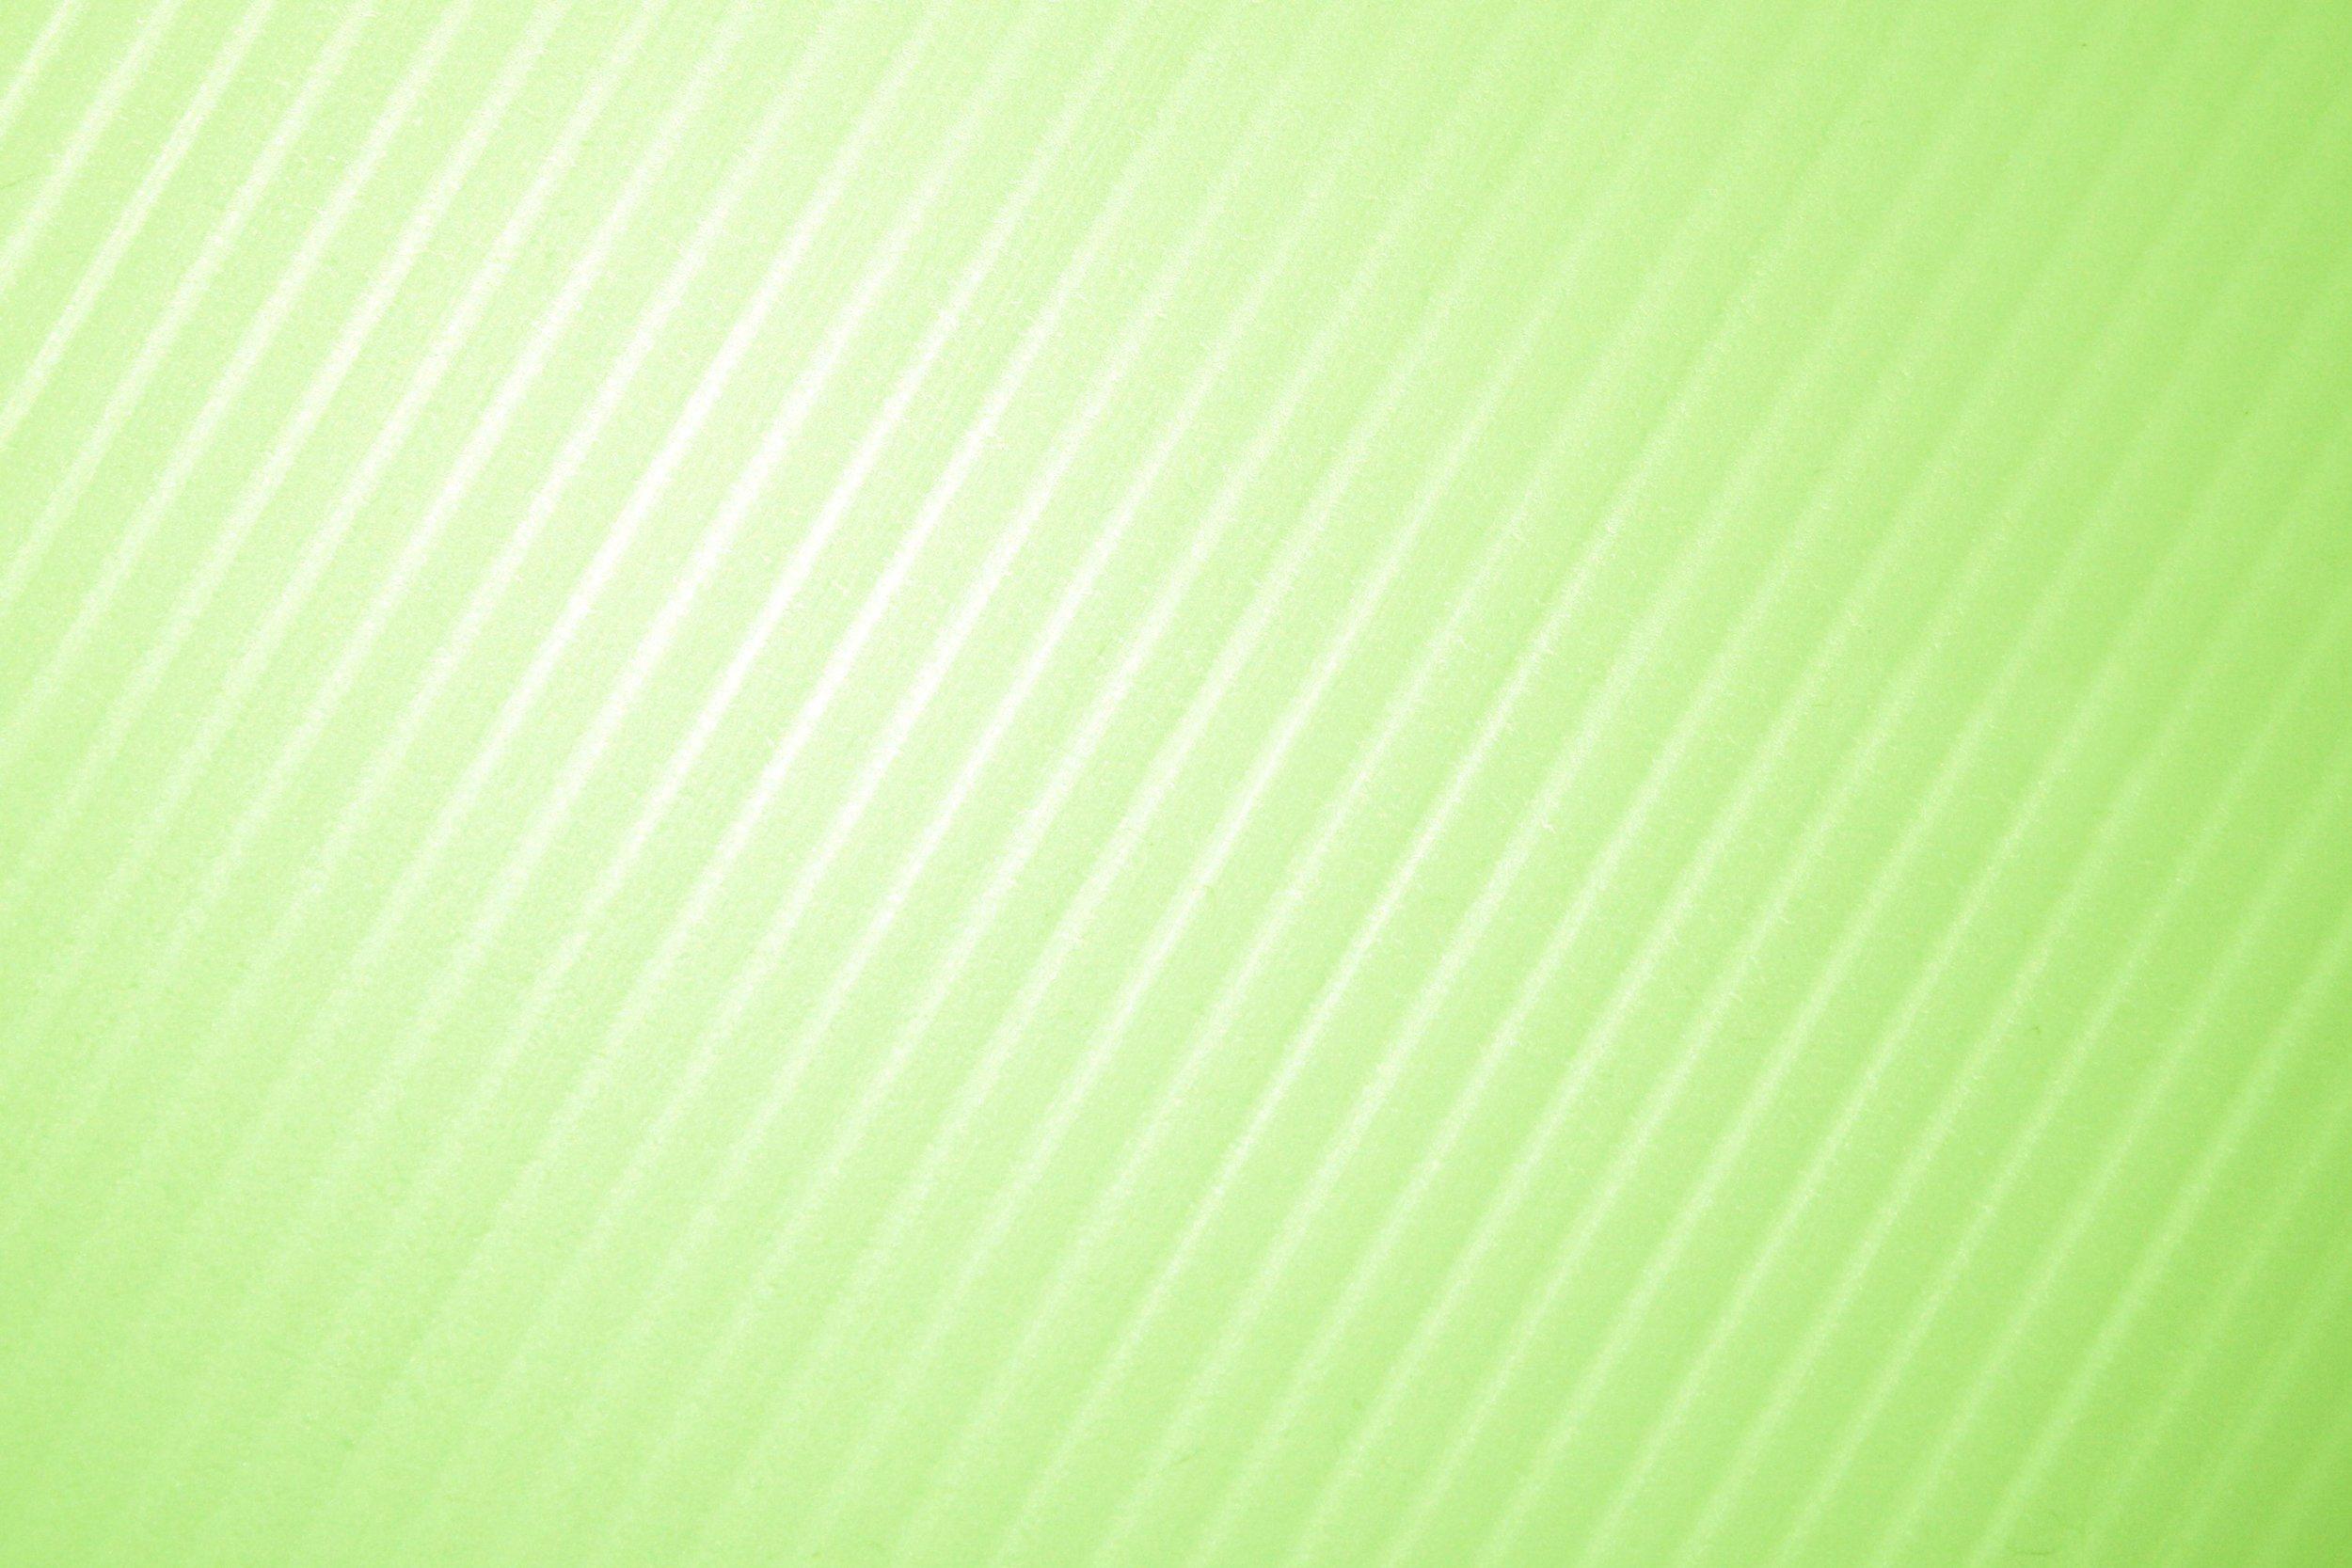 lime-green-diagonal-striped-plastic-texture.jpg